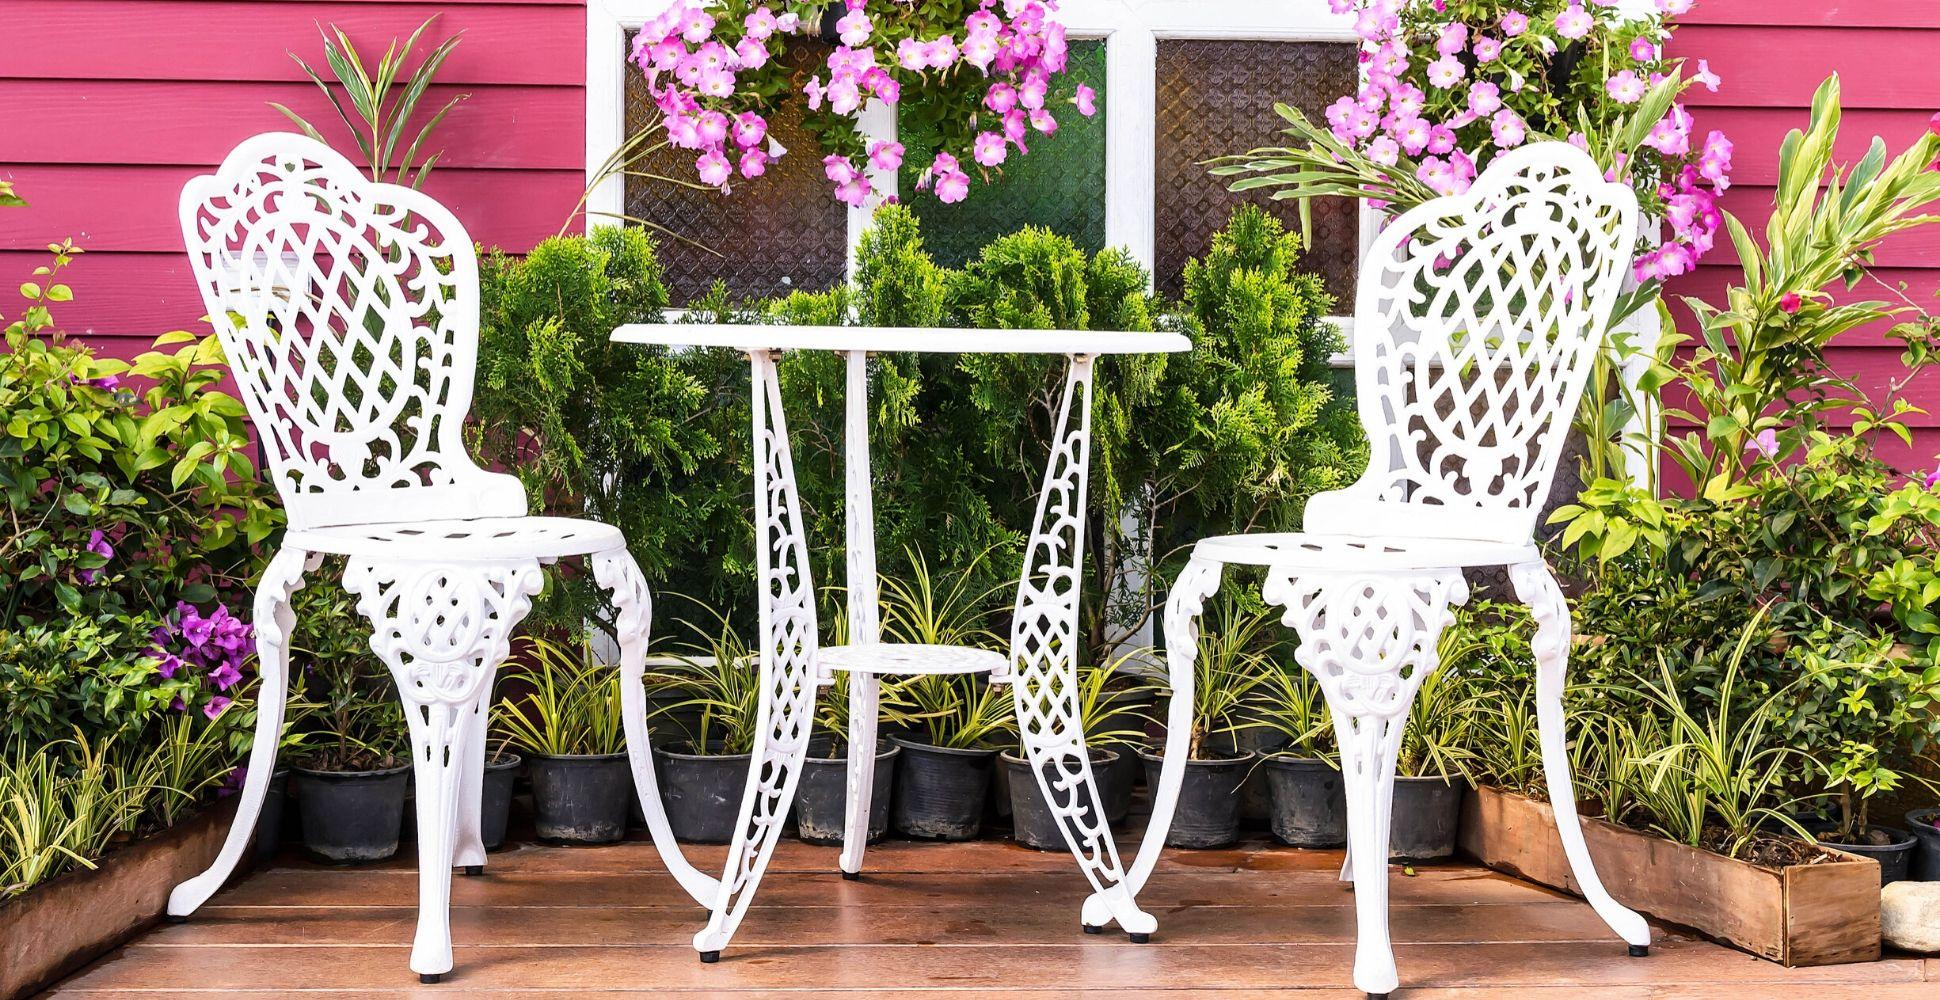 9 Best Paints For Metal Garden Furniture (Oct 9 Review)